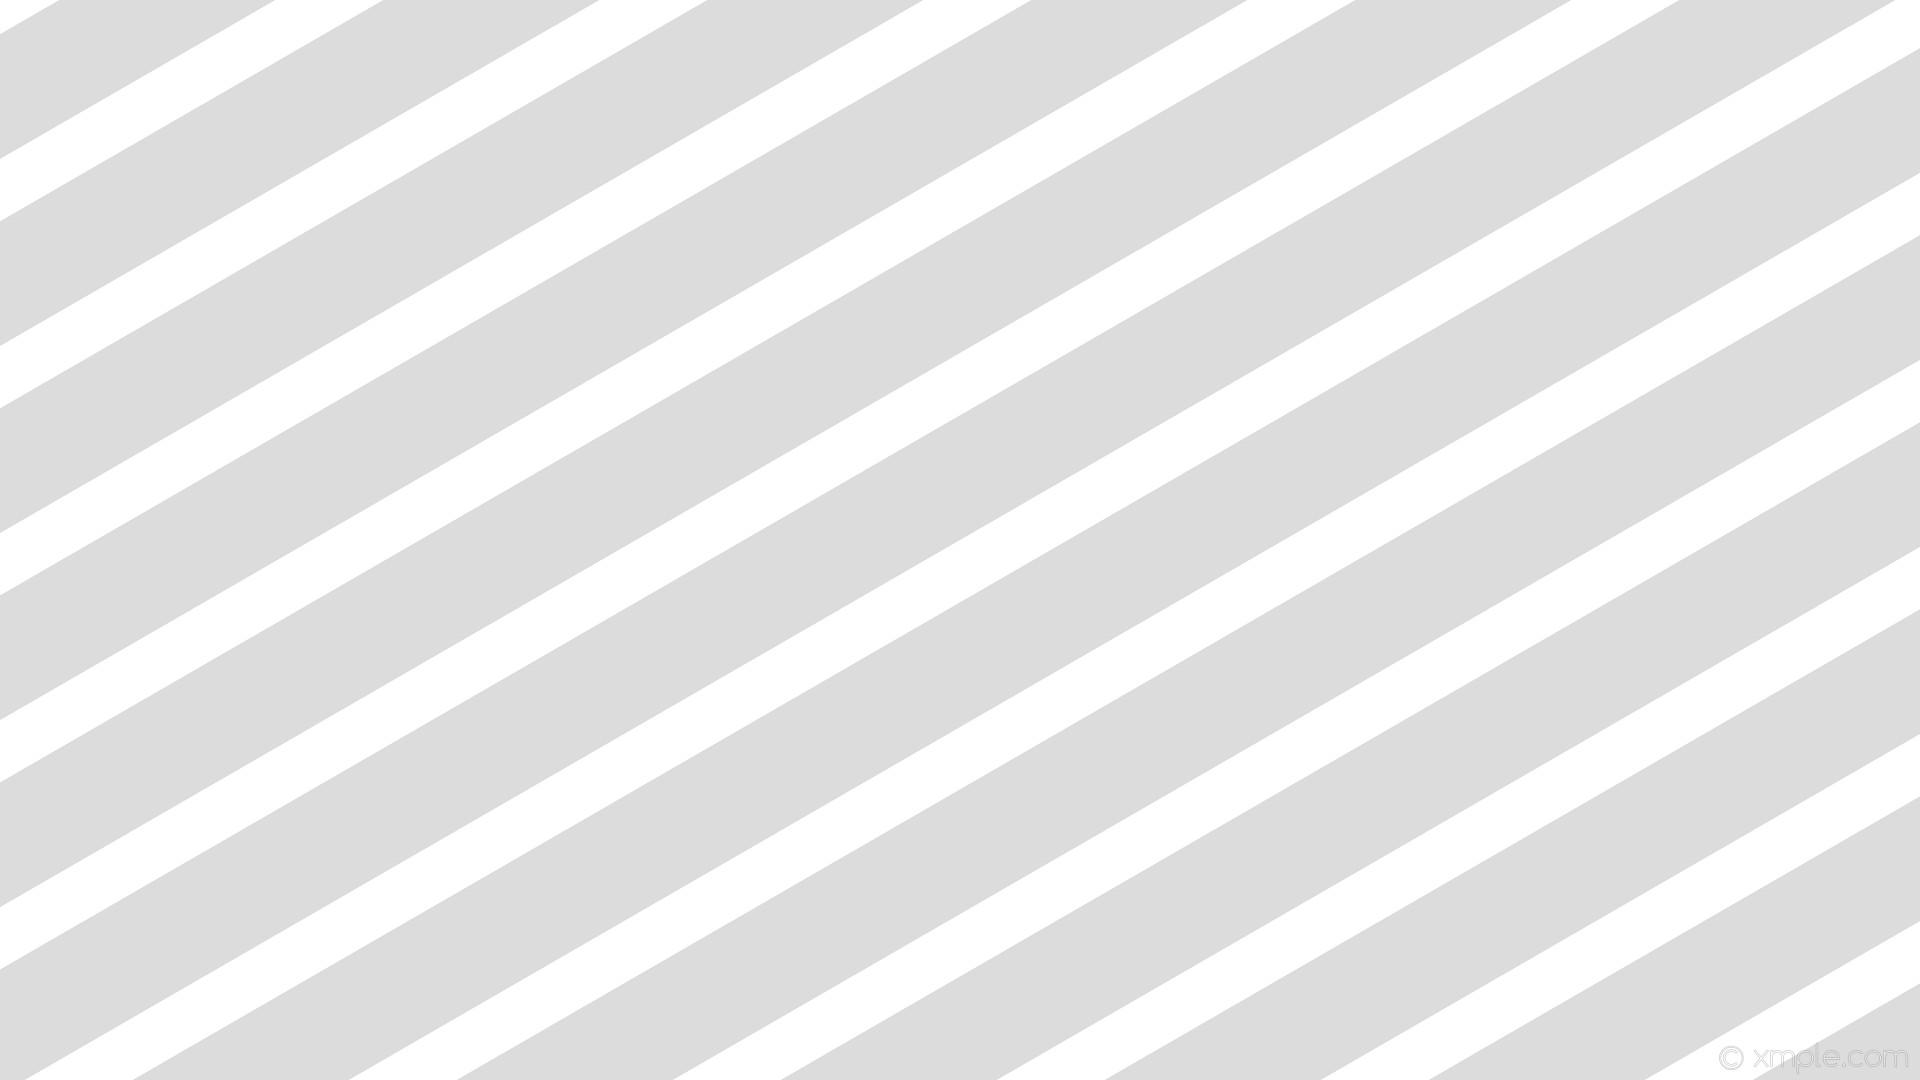 wallpaper white lines stripes streaks grey gainsboro #ffffff #dcdcdc  diagonal 30° 54px 108px